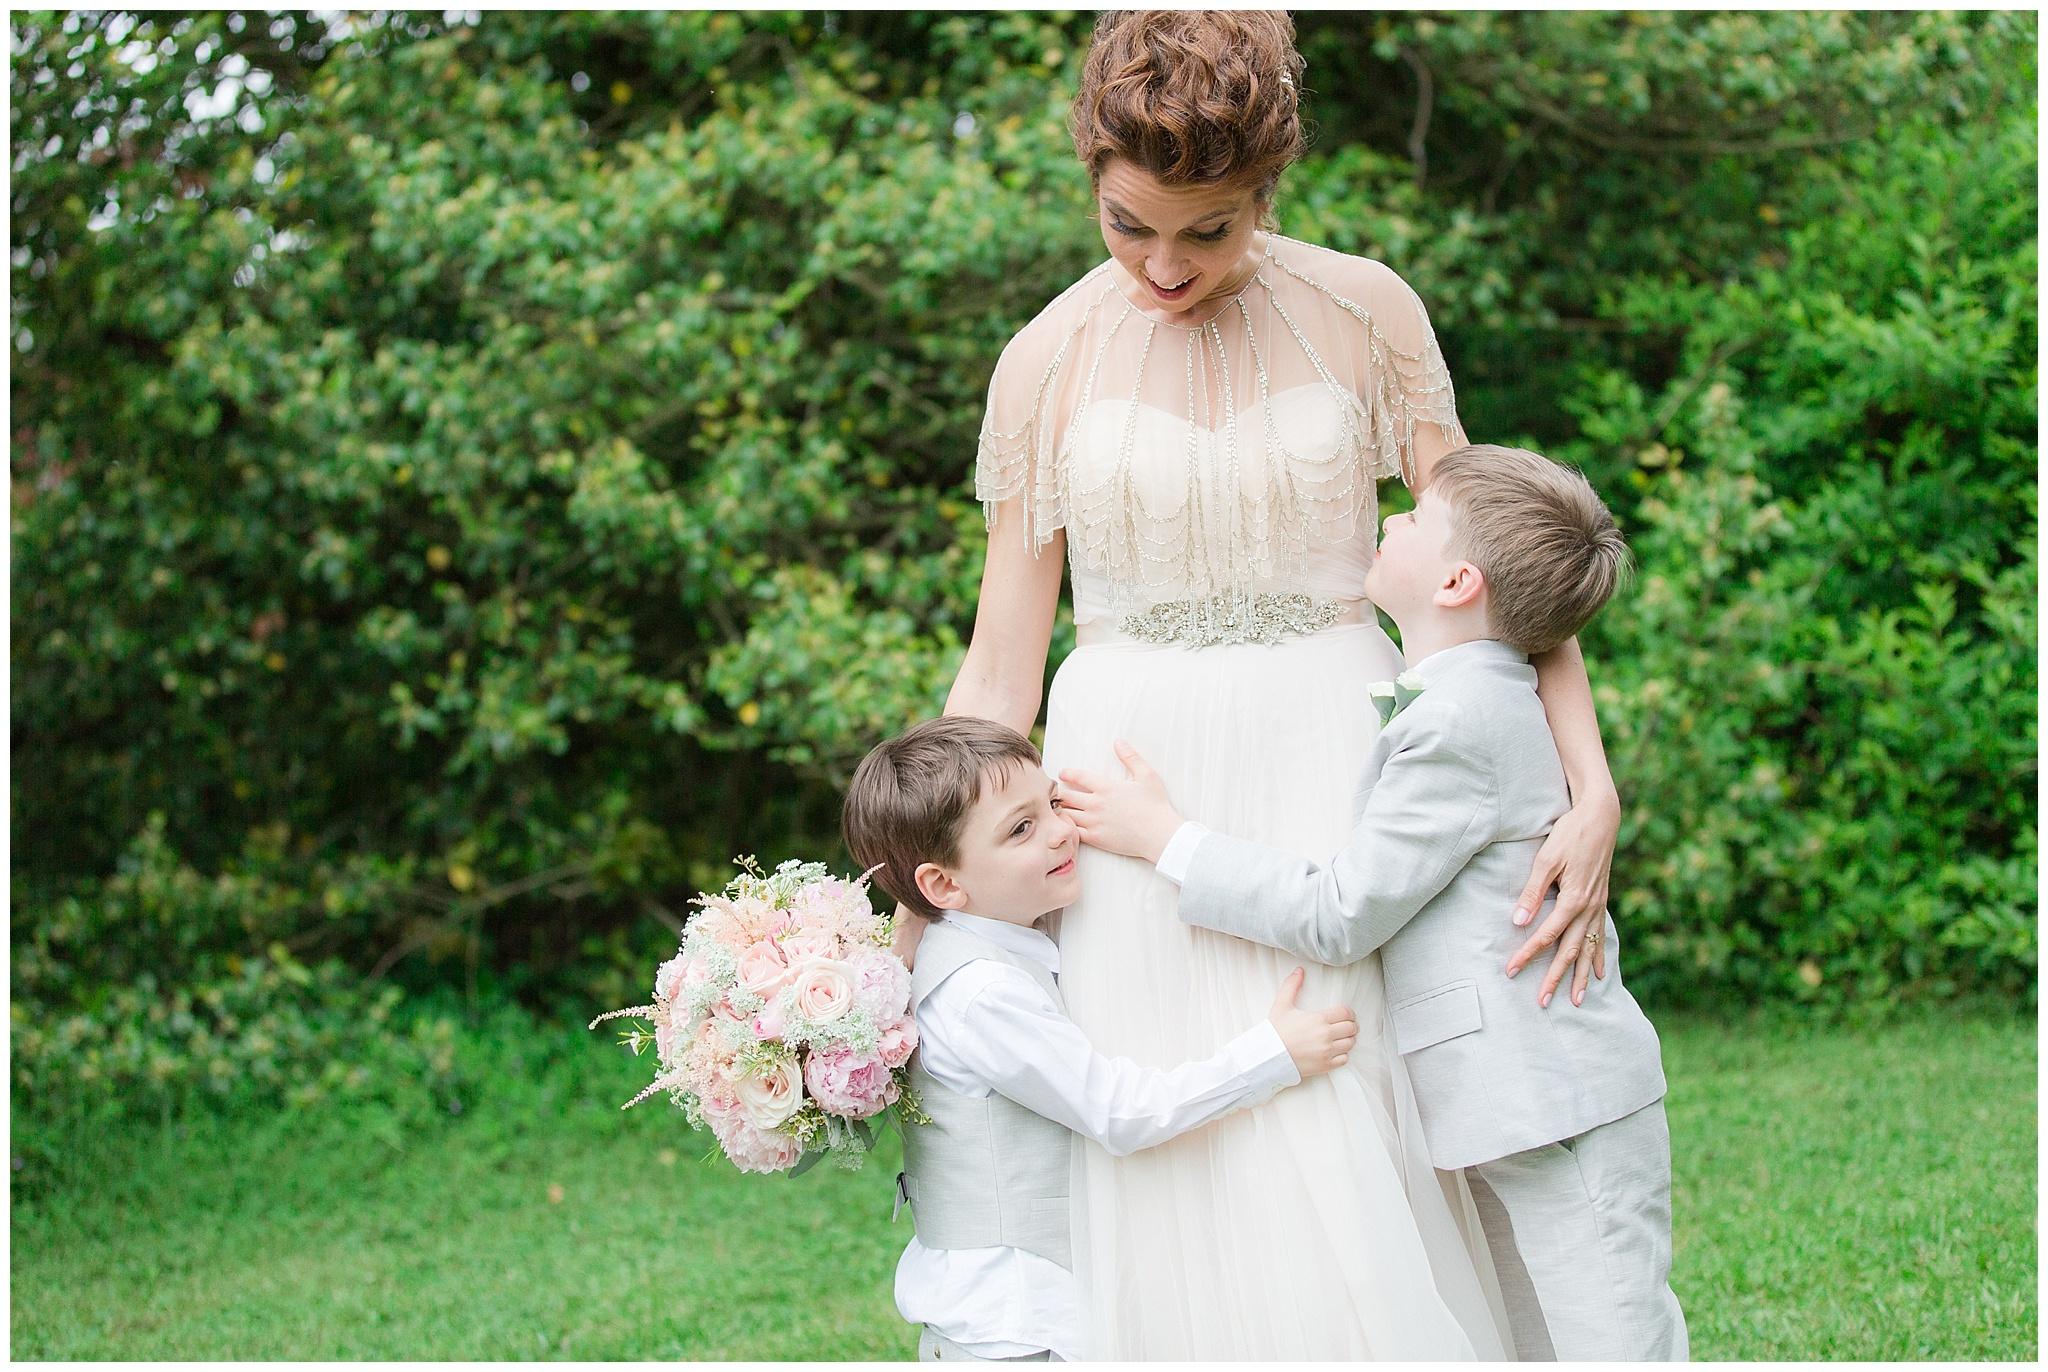 Wedding_Courtney_David_0033.jpg